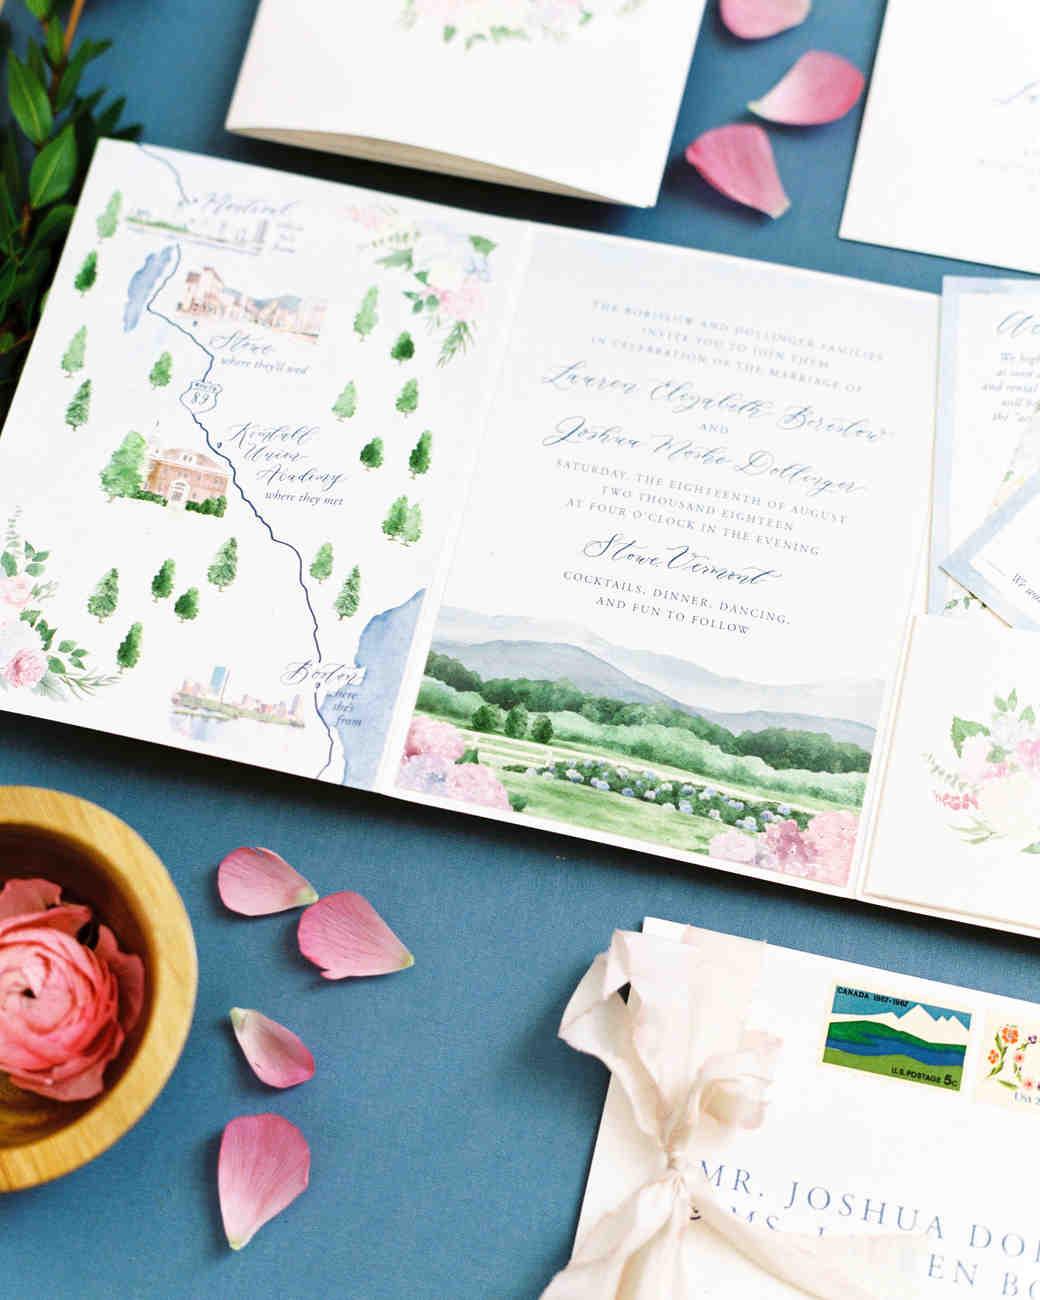 lauren josh wedding invitations